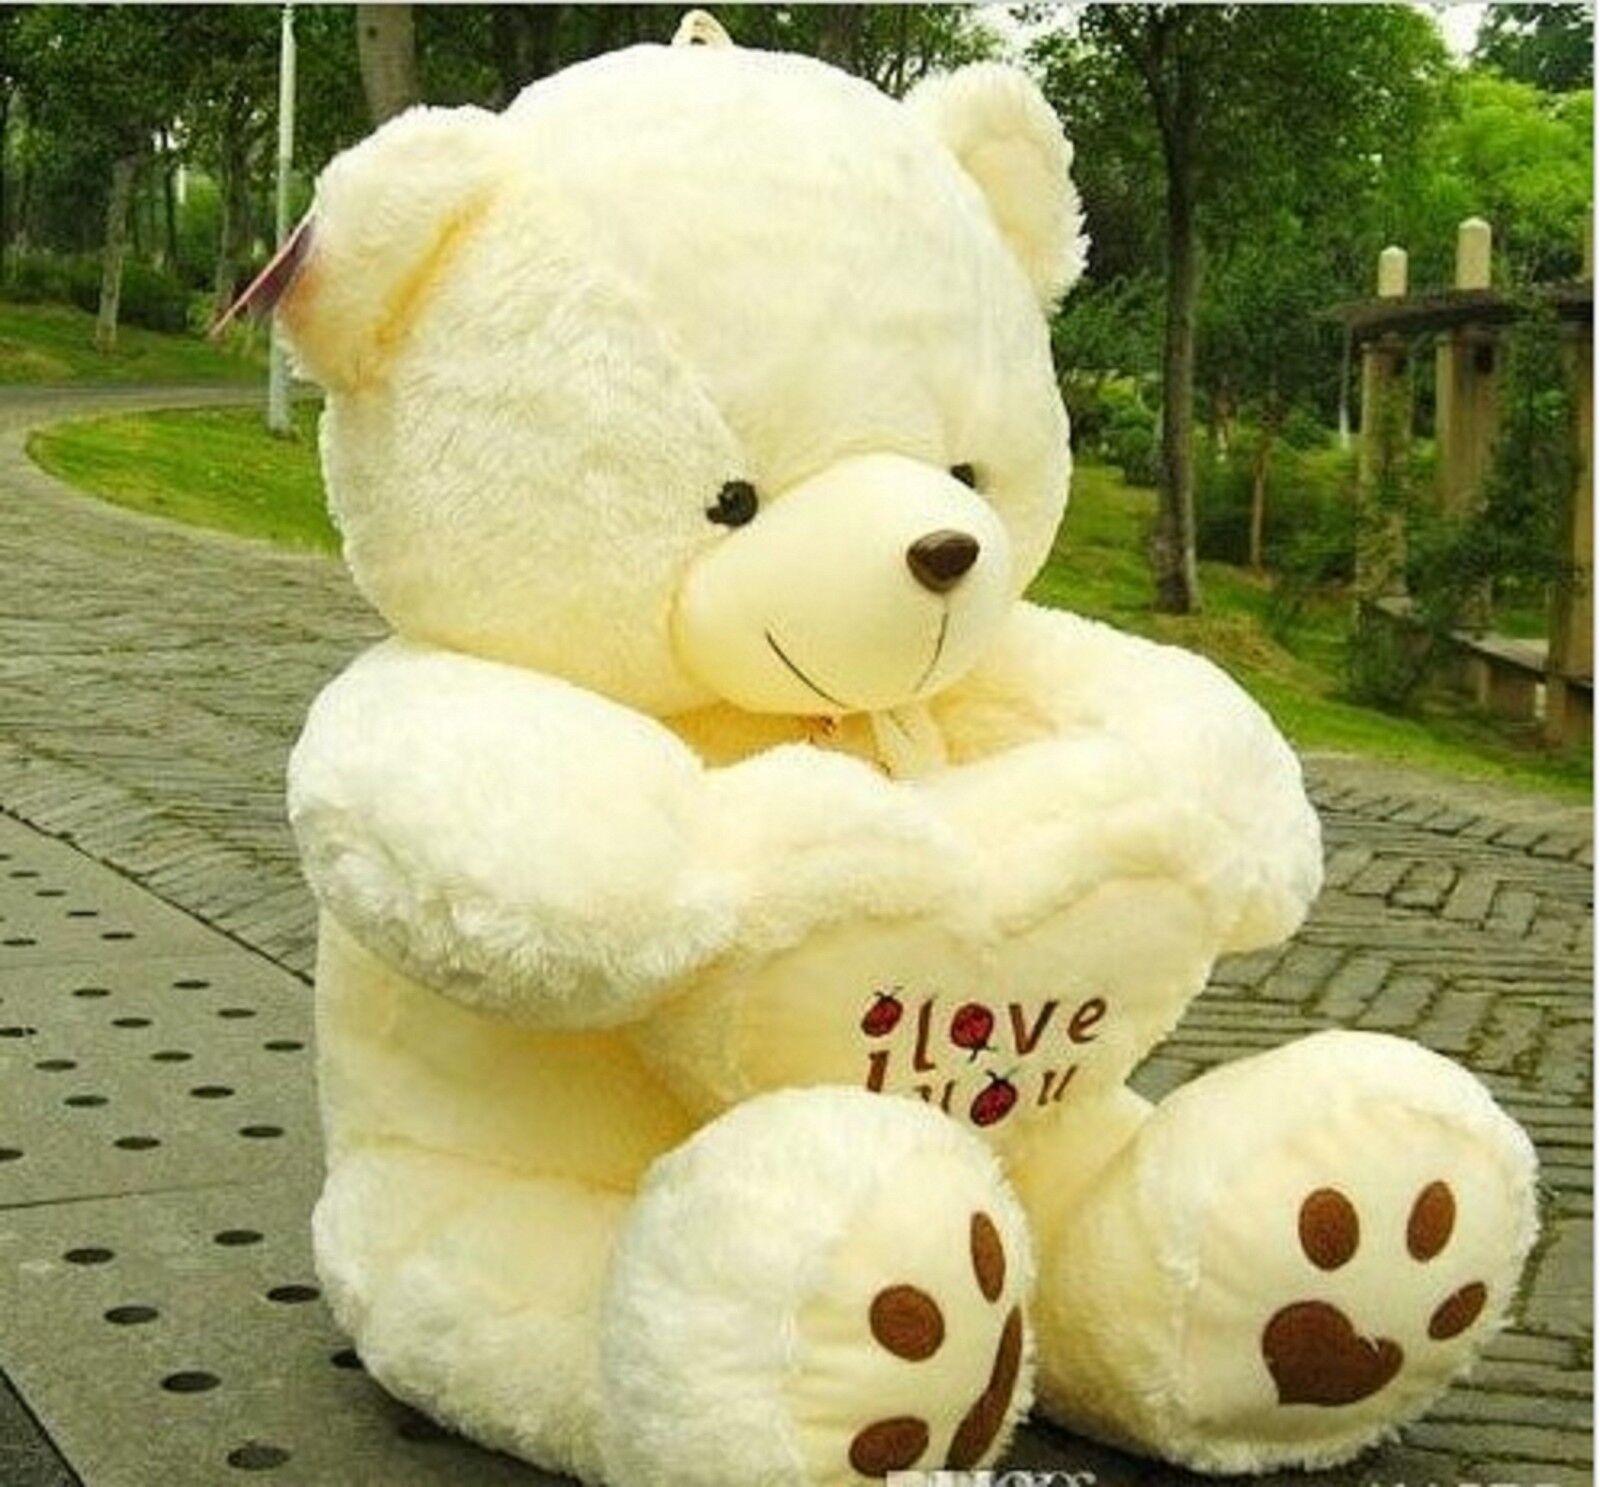 a653f400160e 50cm Giant Large HUGE Big Teddy Bear Soft Plush Kid Toys Doll Xmas Birthday  Gift for sale online